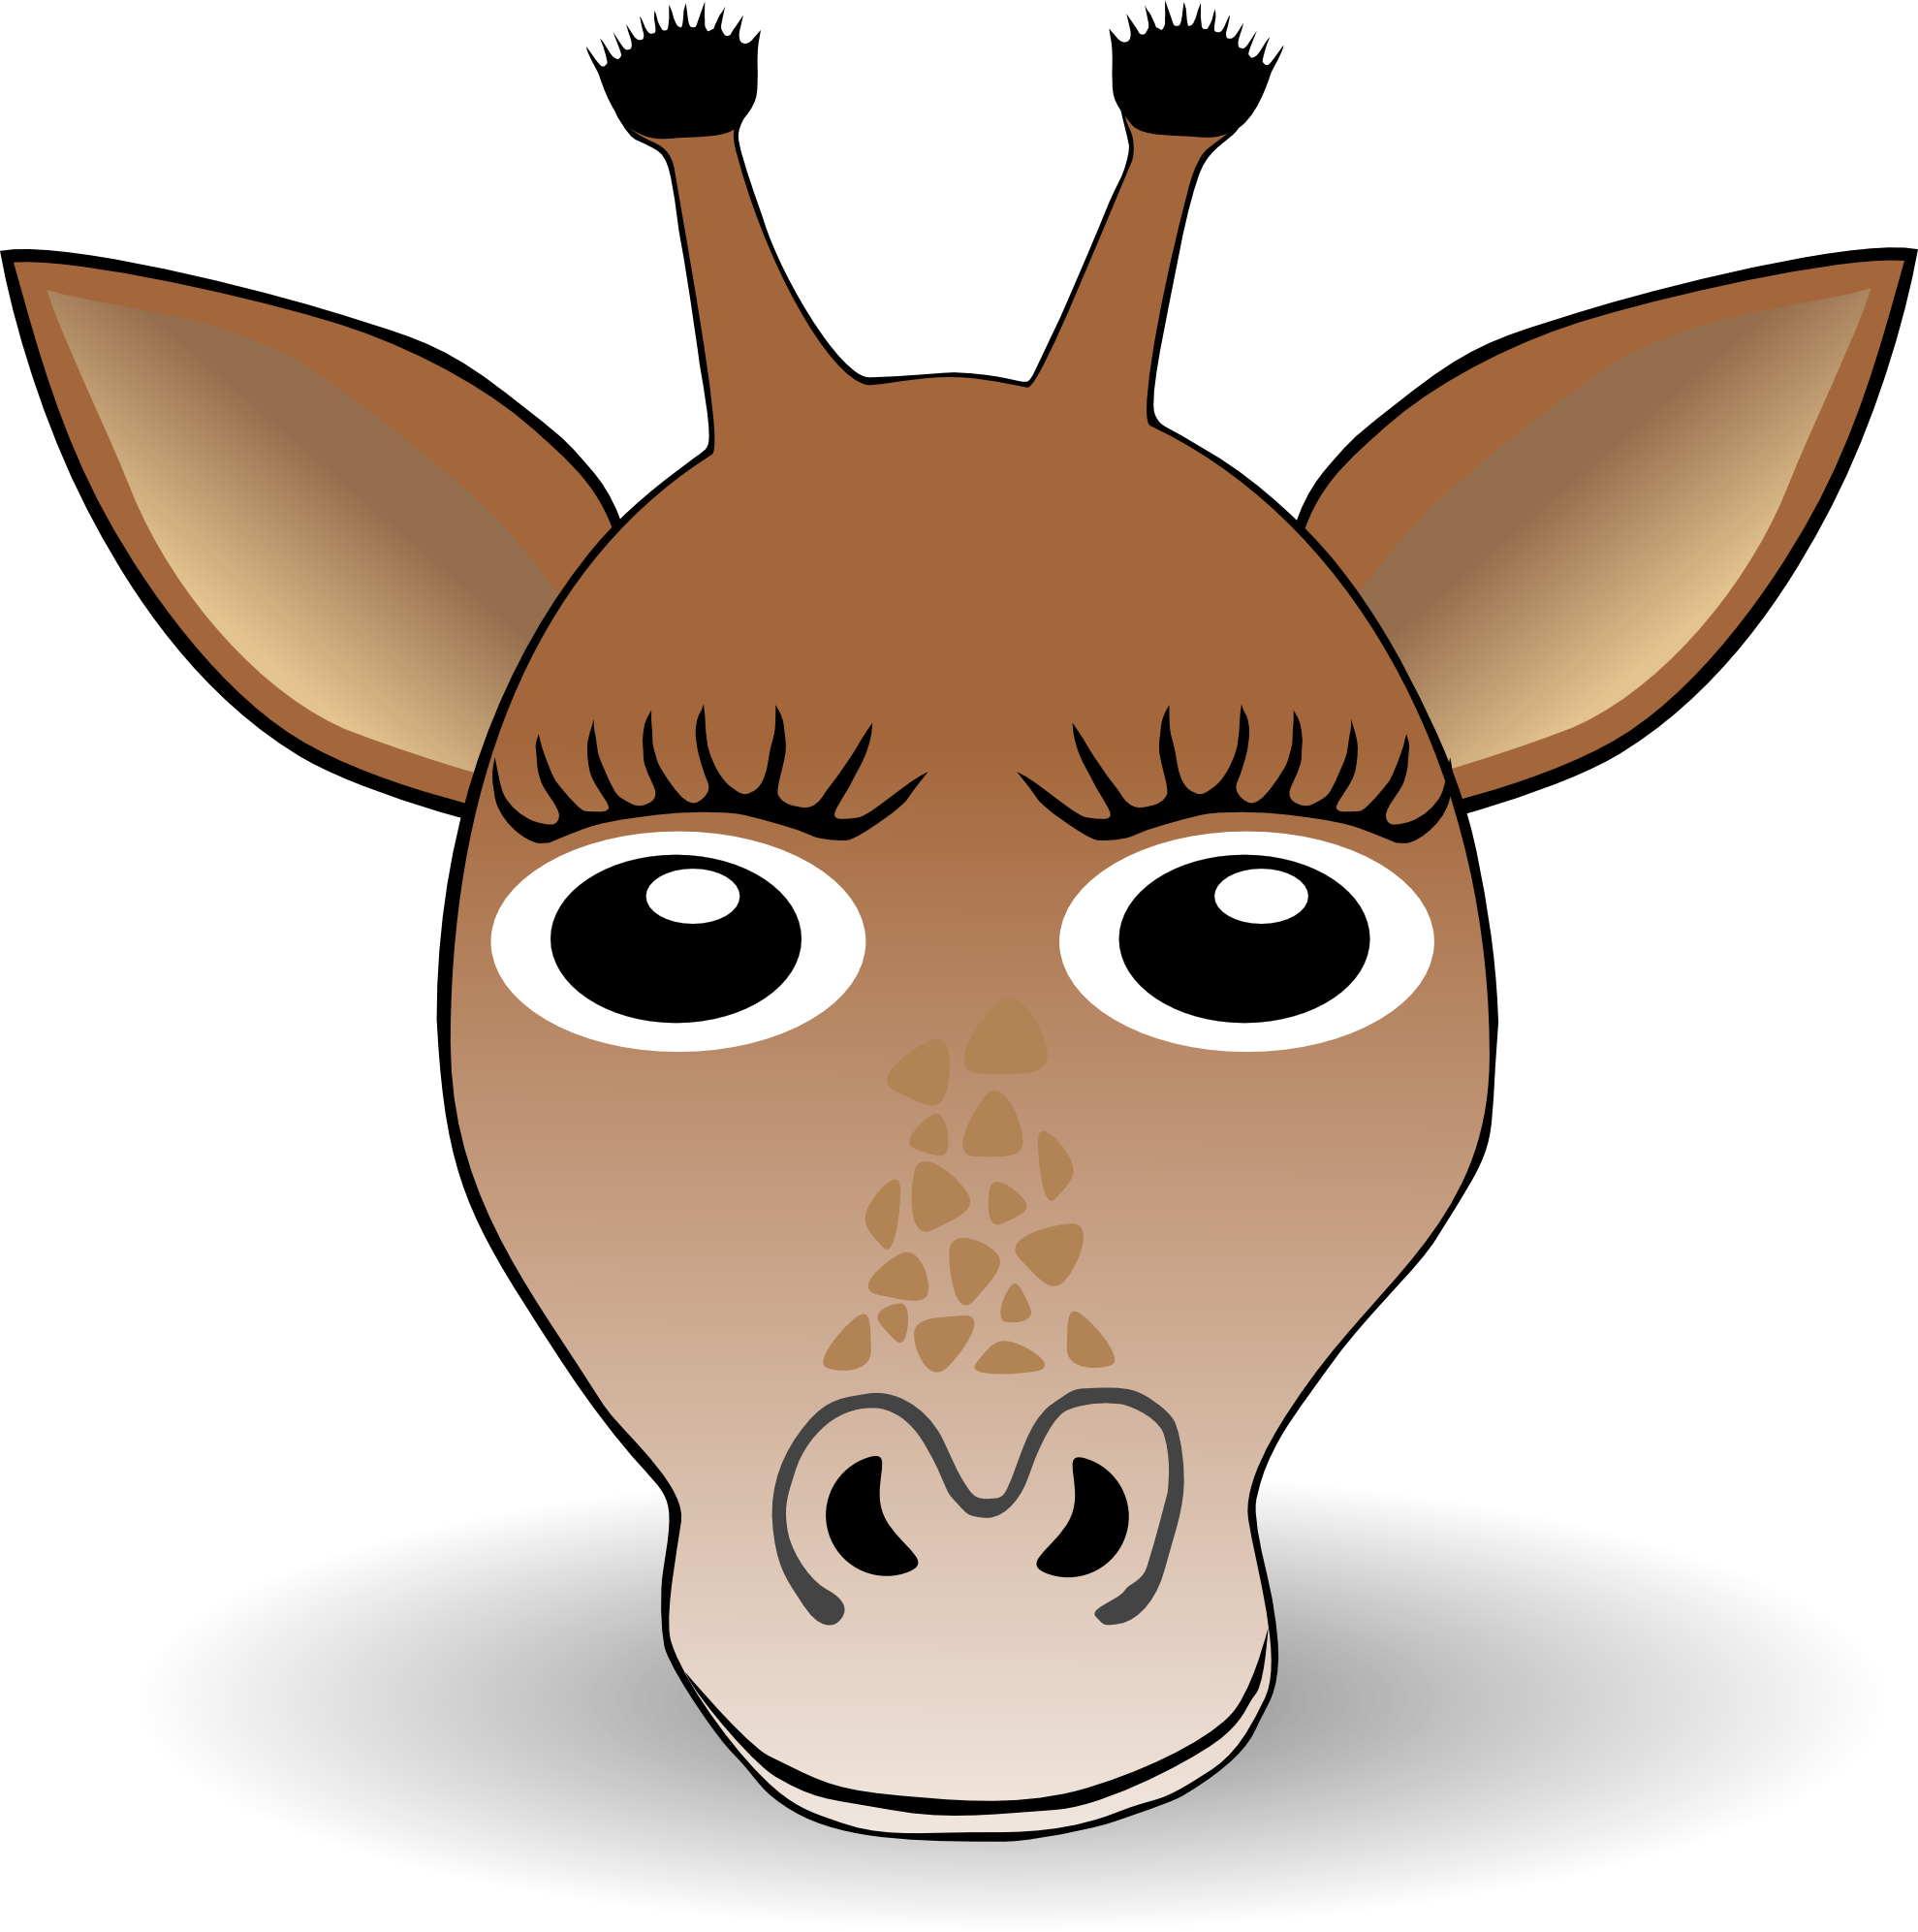 Clip Art: Giraffe 1 face Christmas Xmas Stuffed ...